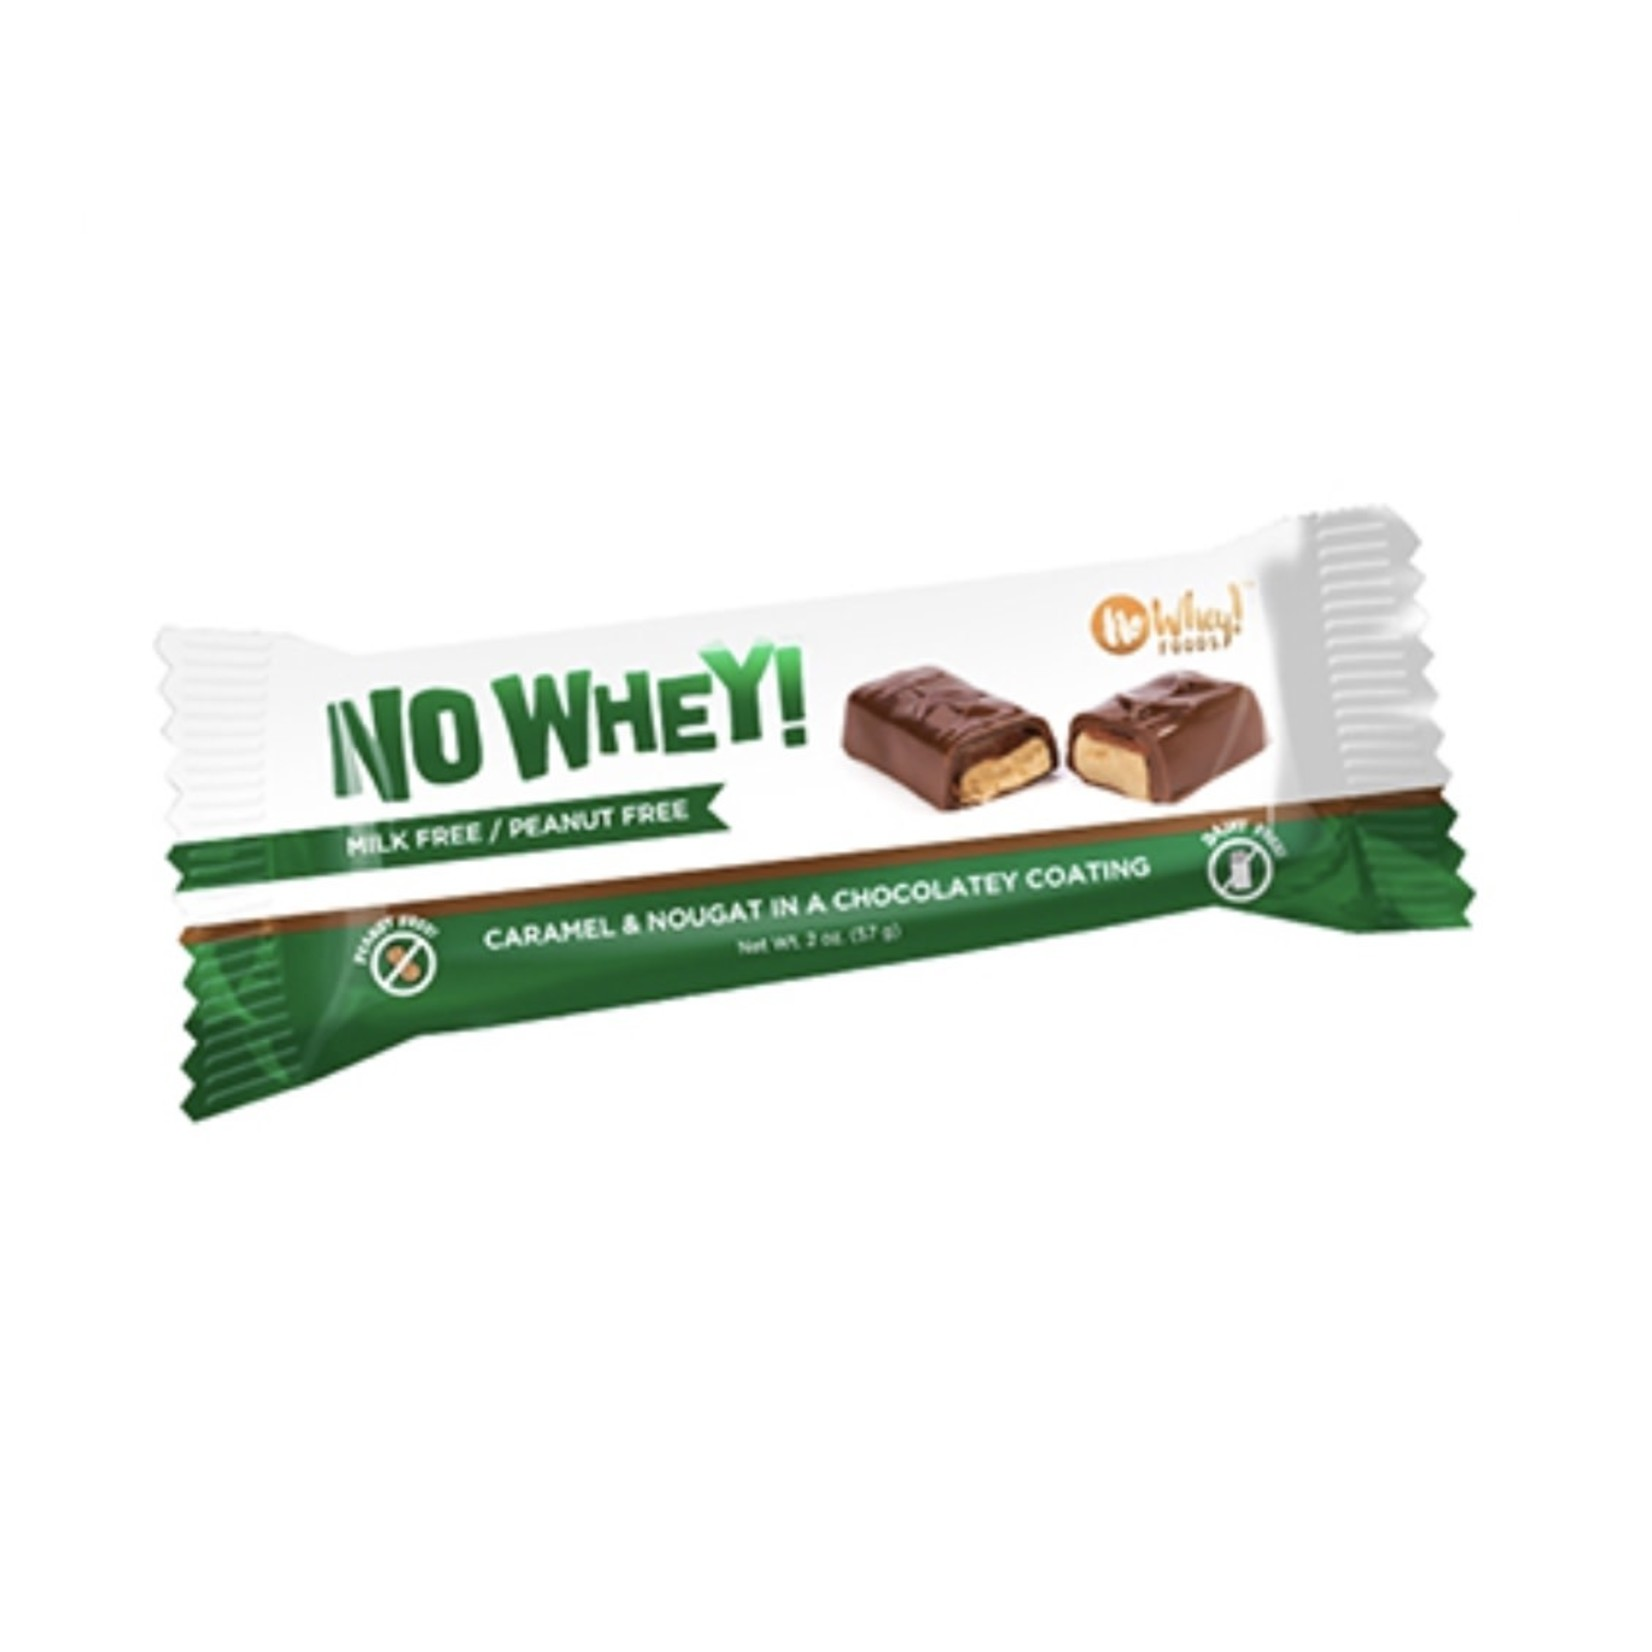 No Whey! No Whey! Caramel & Nougat Bar